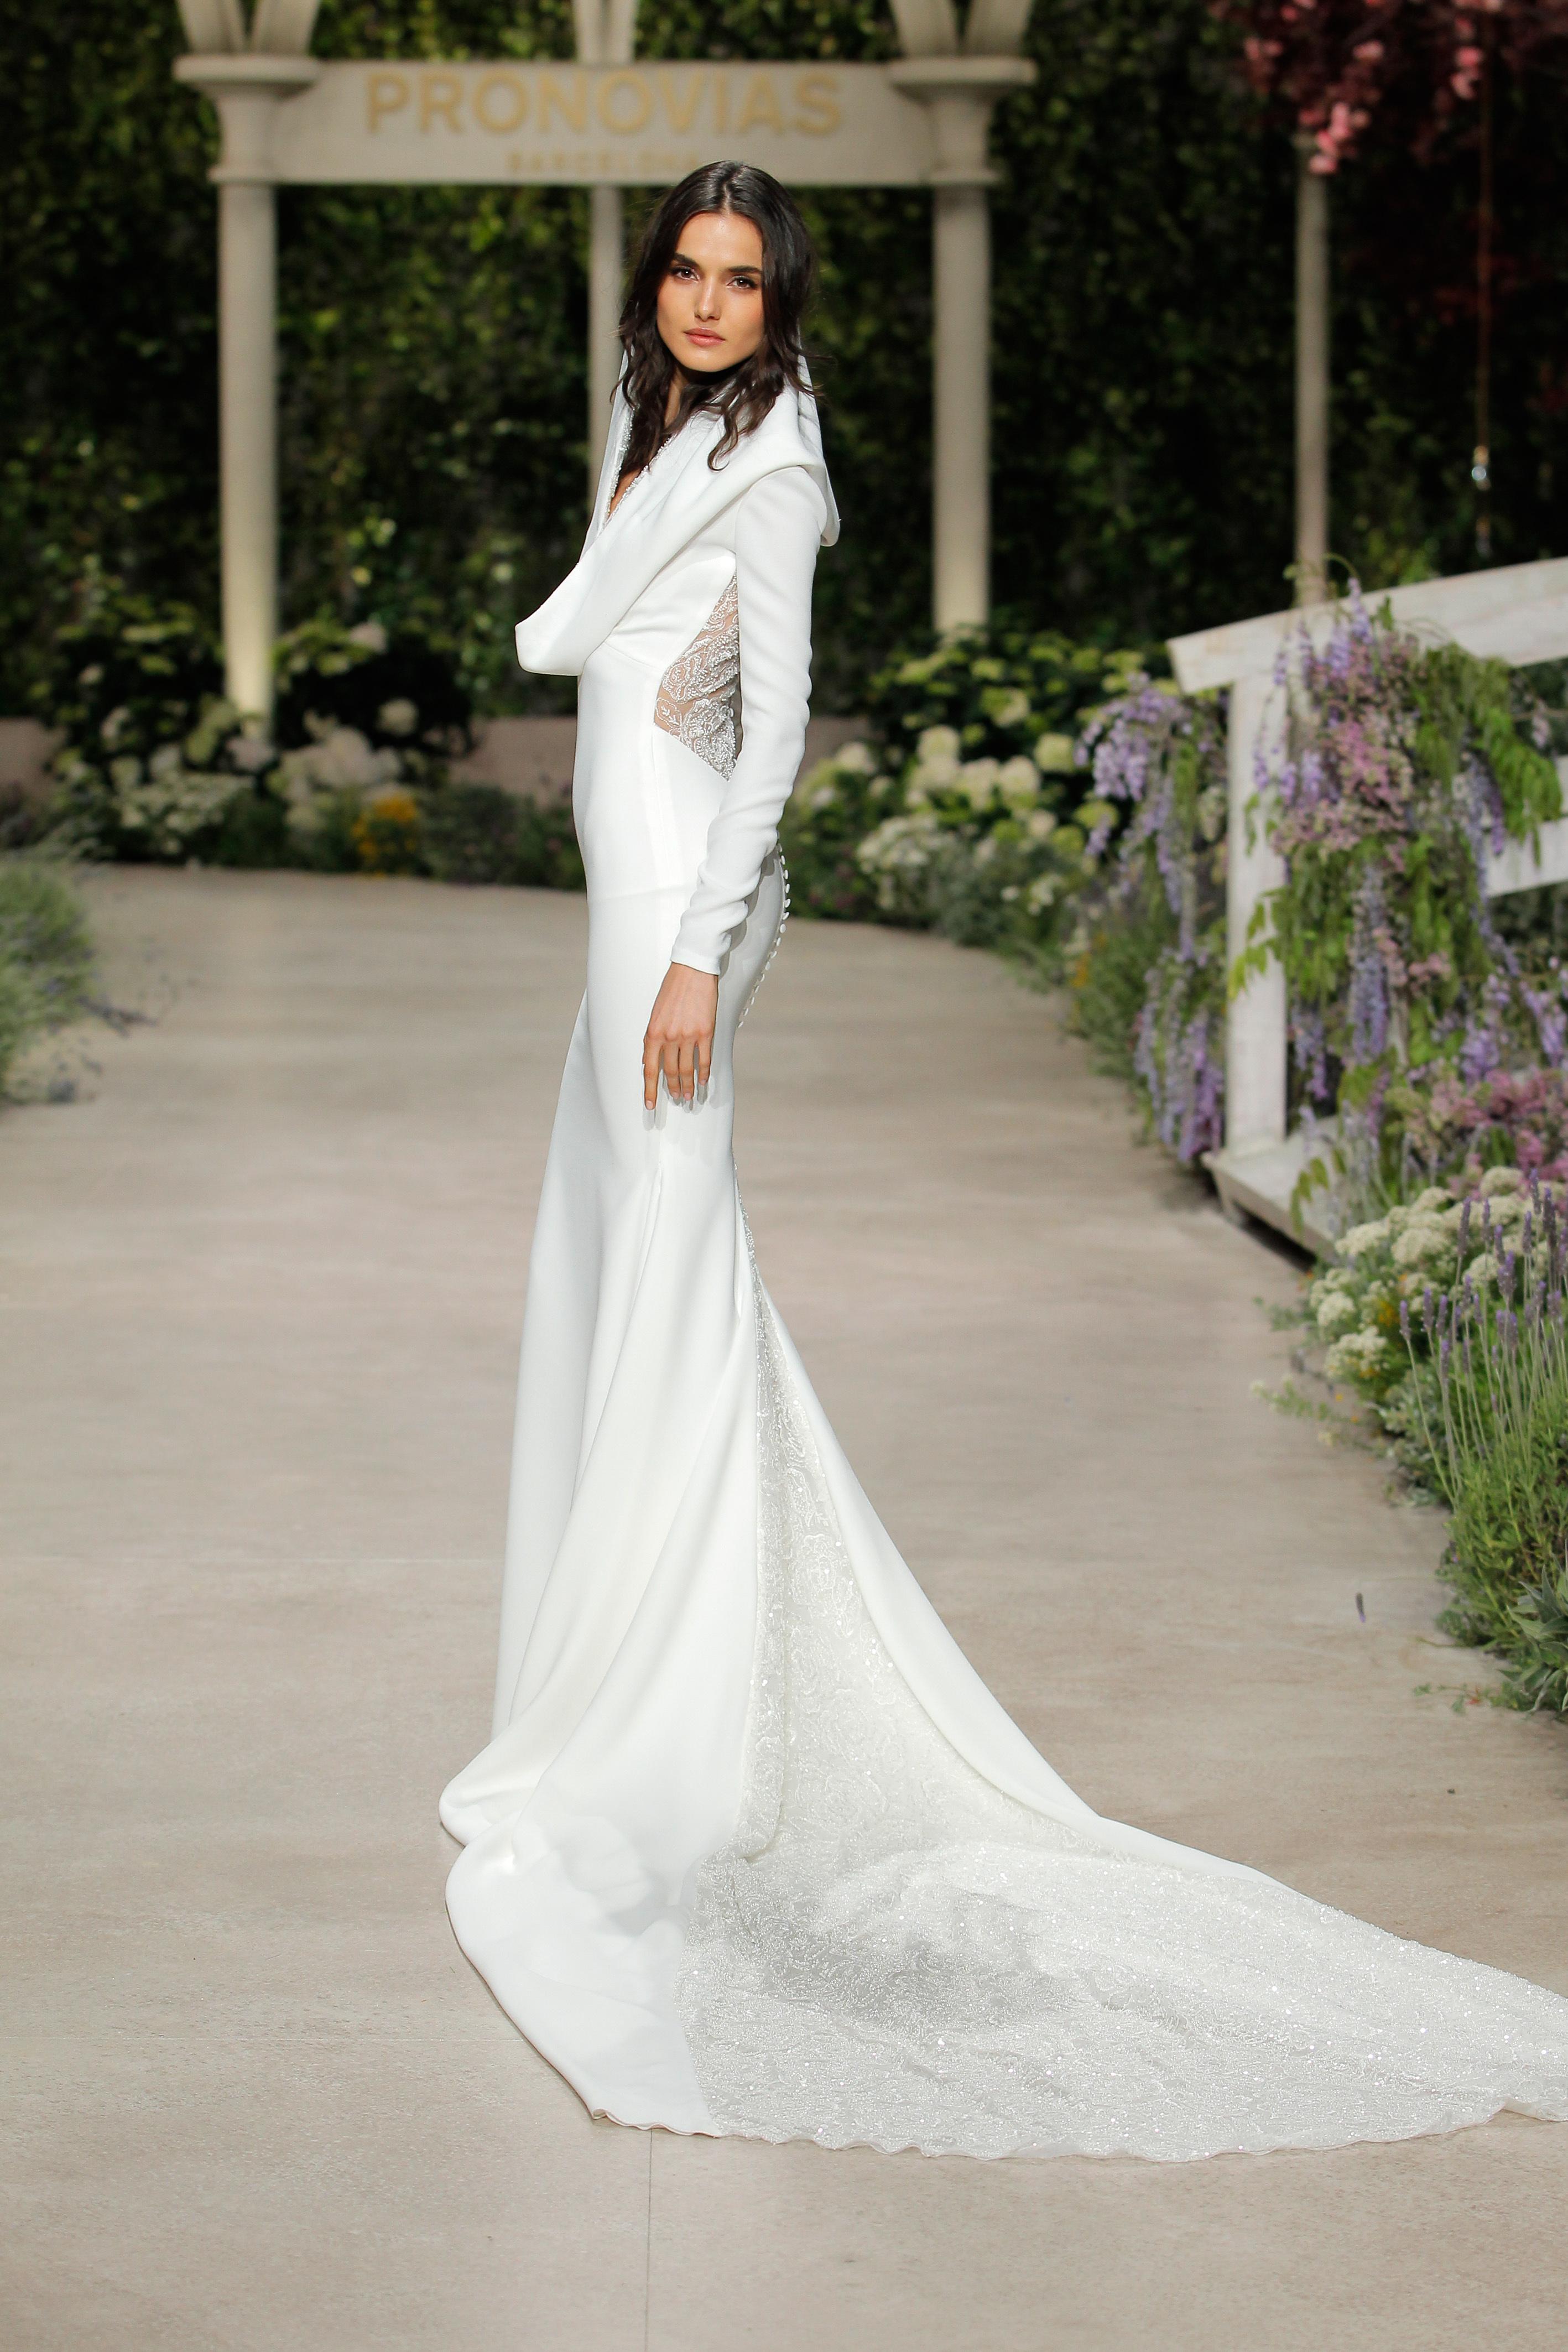 pronovias wedding dress spring 2019 sheath long sleeve